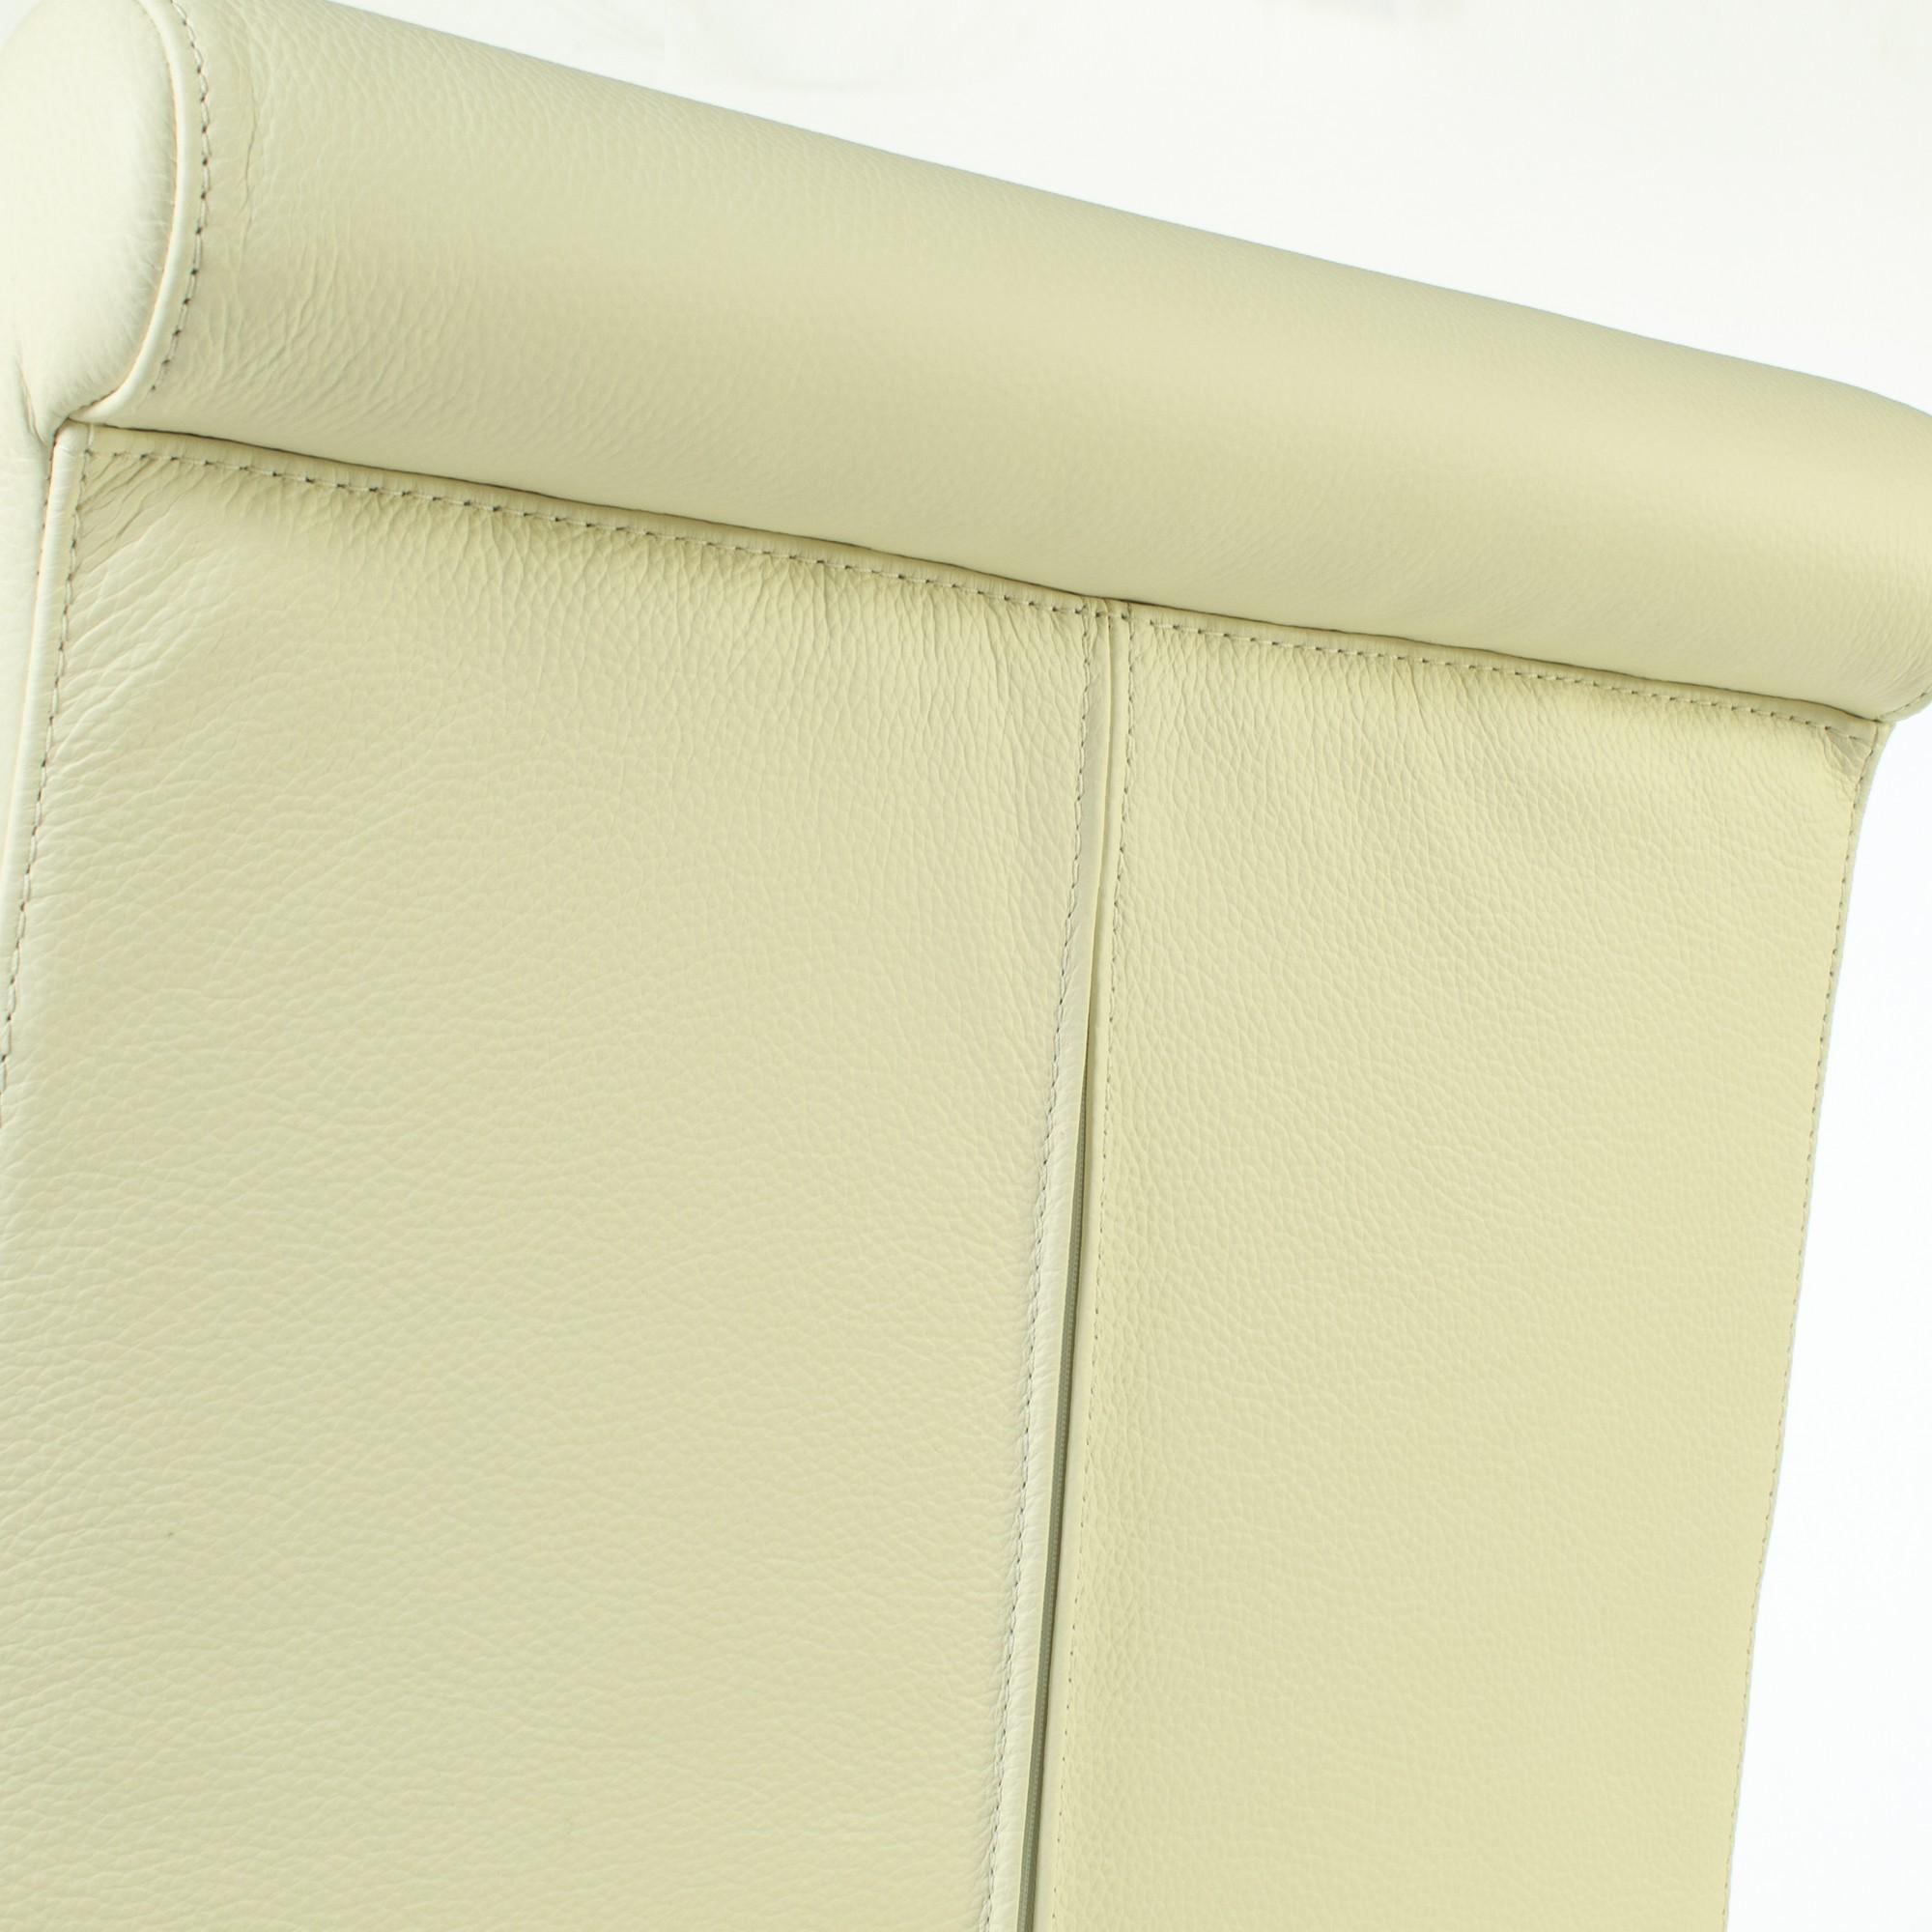 Lederstuhl Armlehnstuhl Galdo Creme Weiß Wenge # Lowboard Wenge Weiß